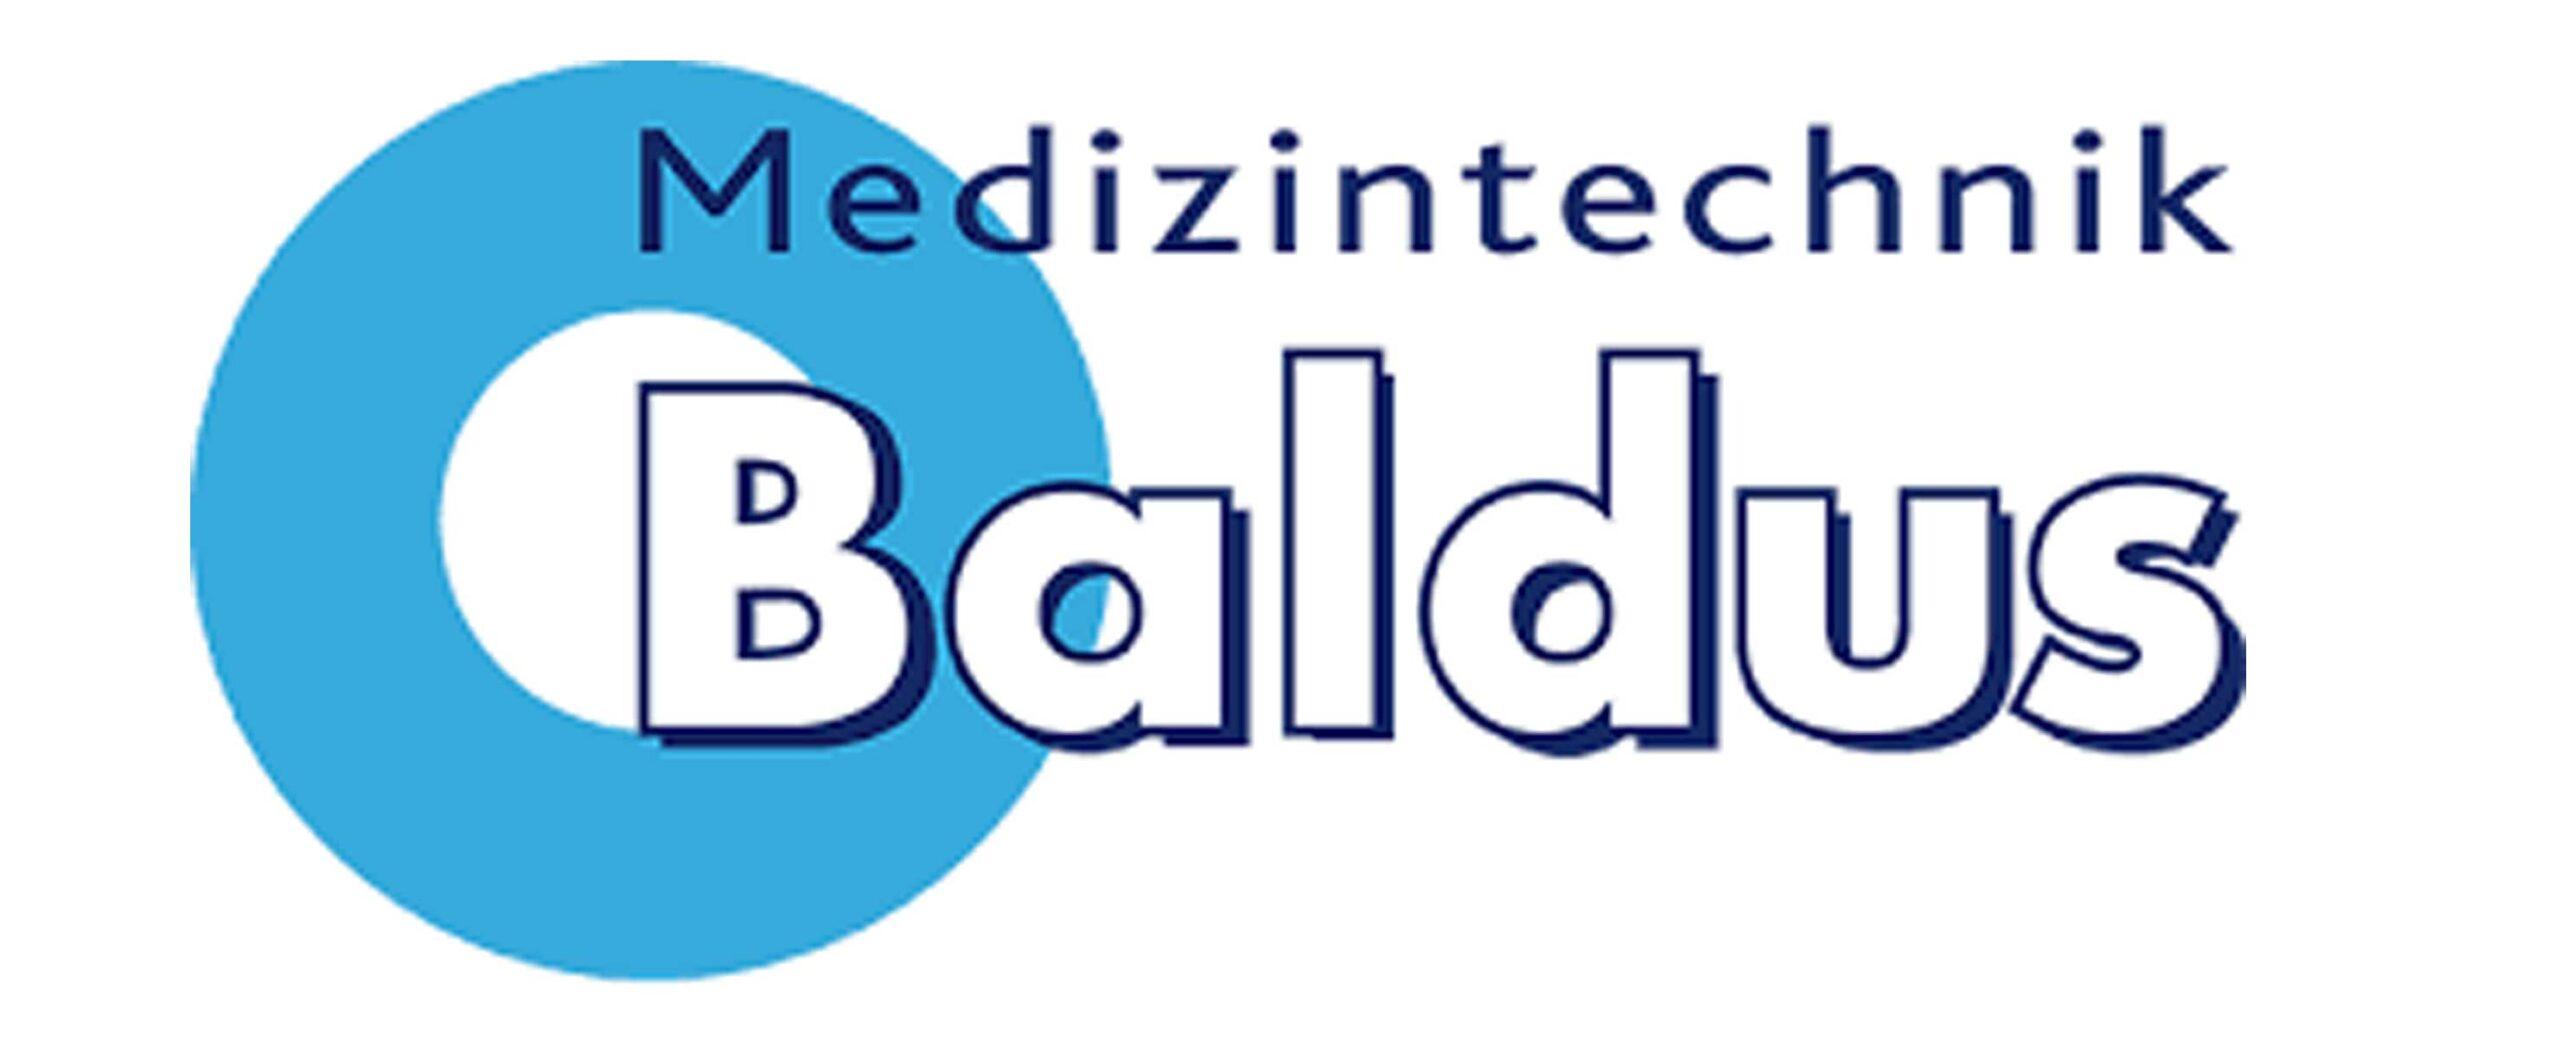 Baldus distribuidor dental en España